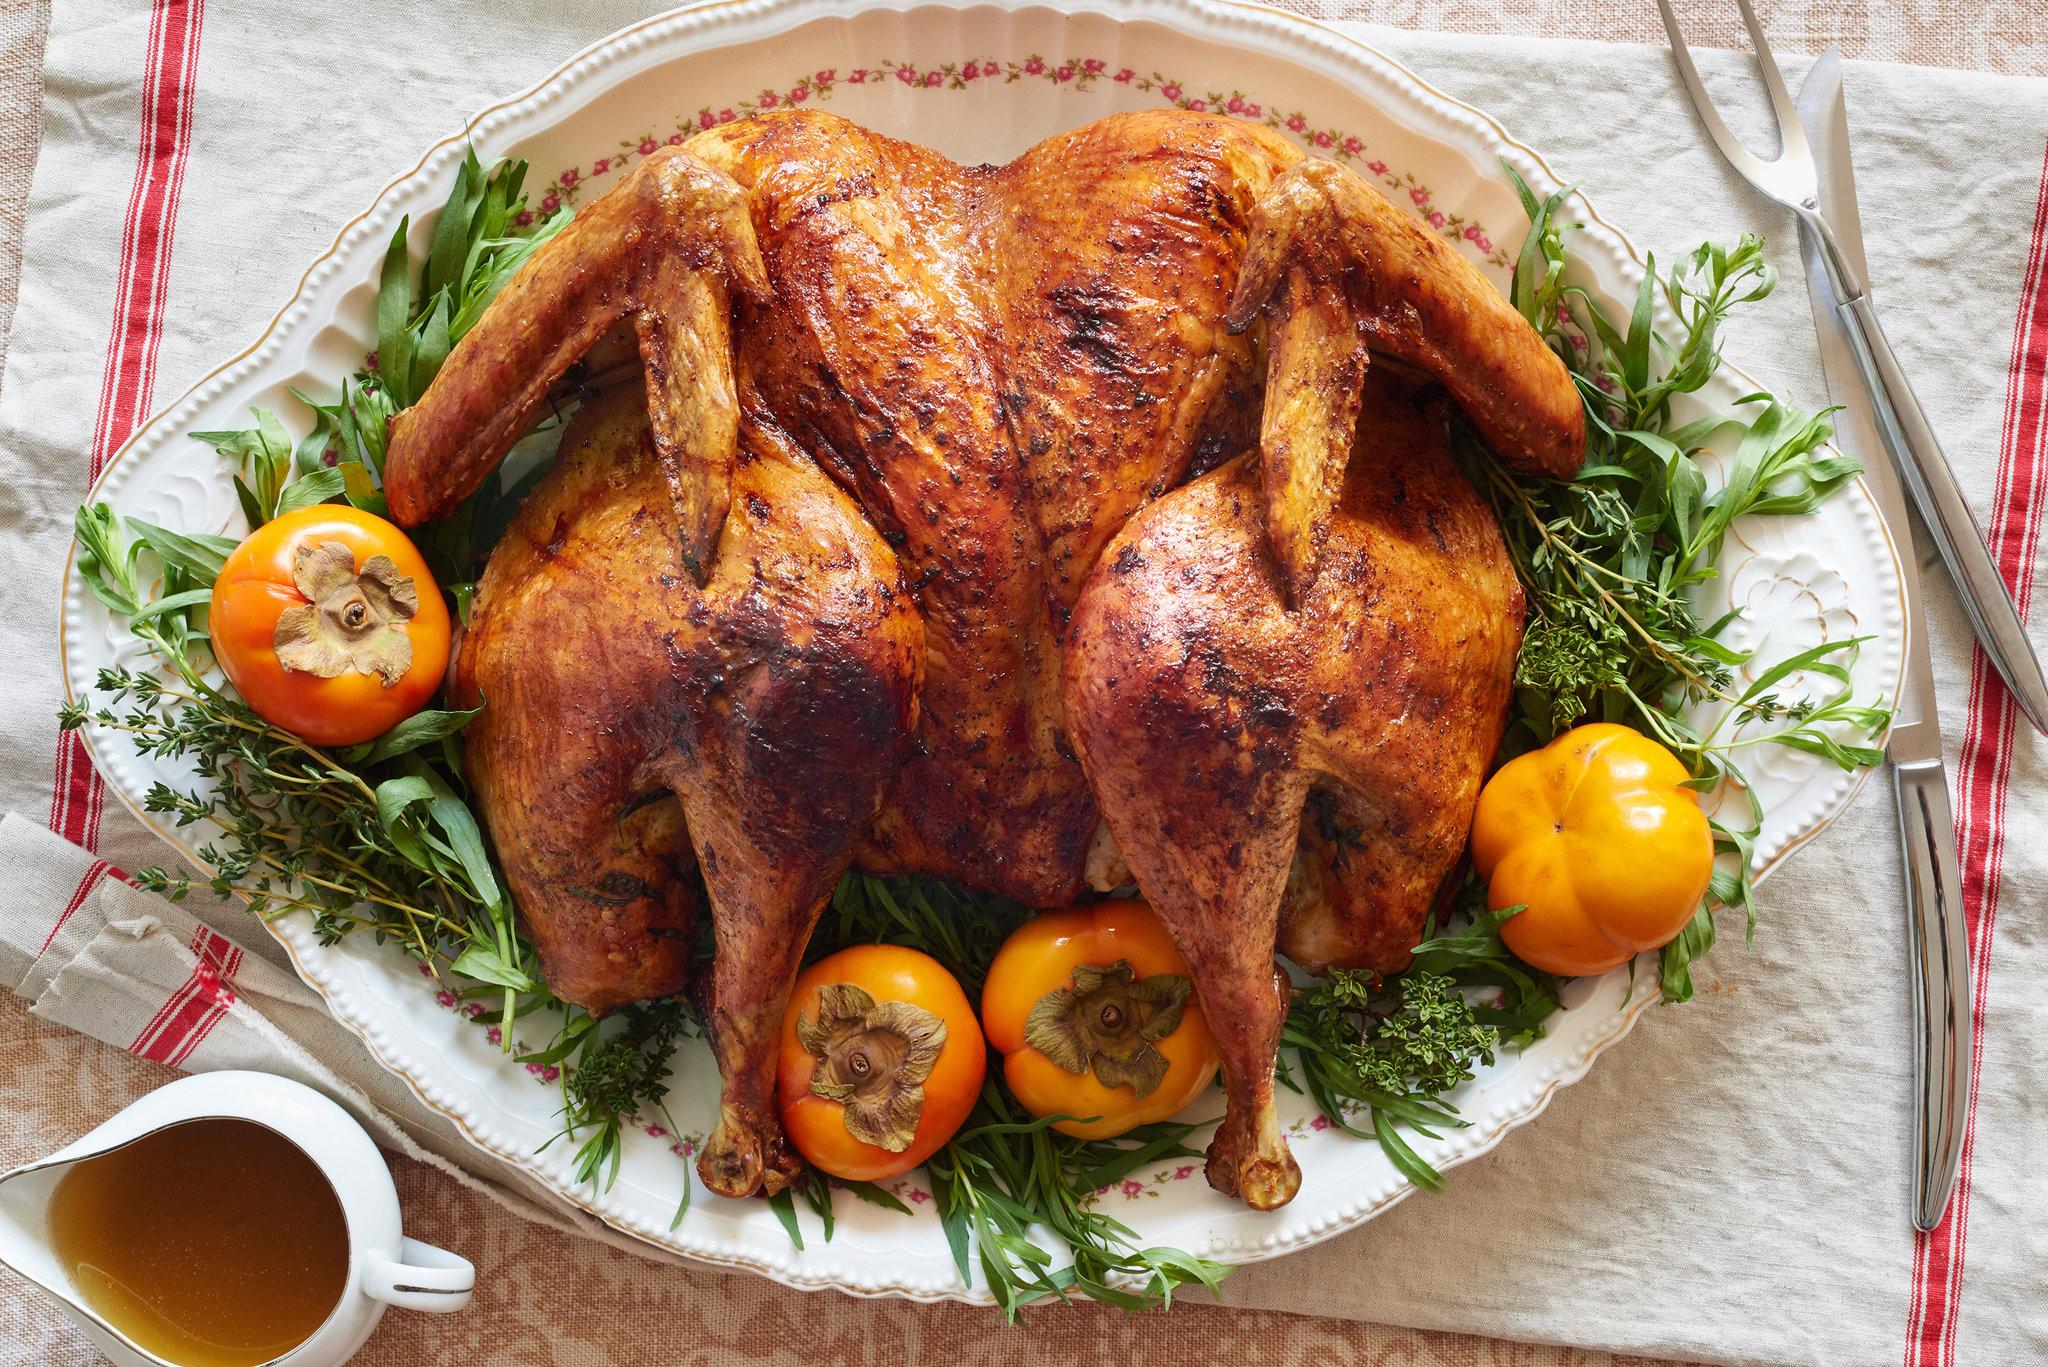 Cooked Thanksgiving Turkey  45 Minute Roast Turkey Recipe NYT Cooking